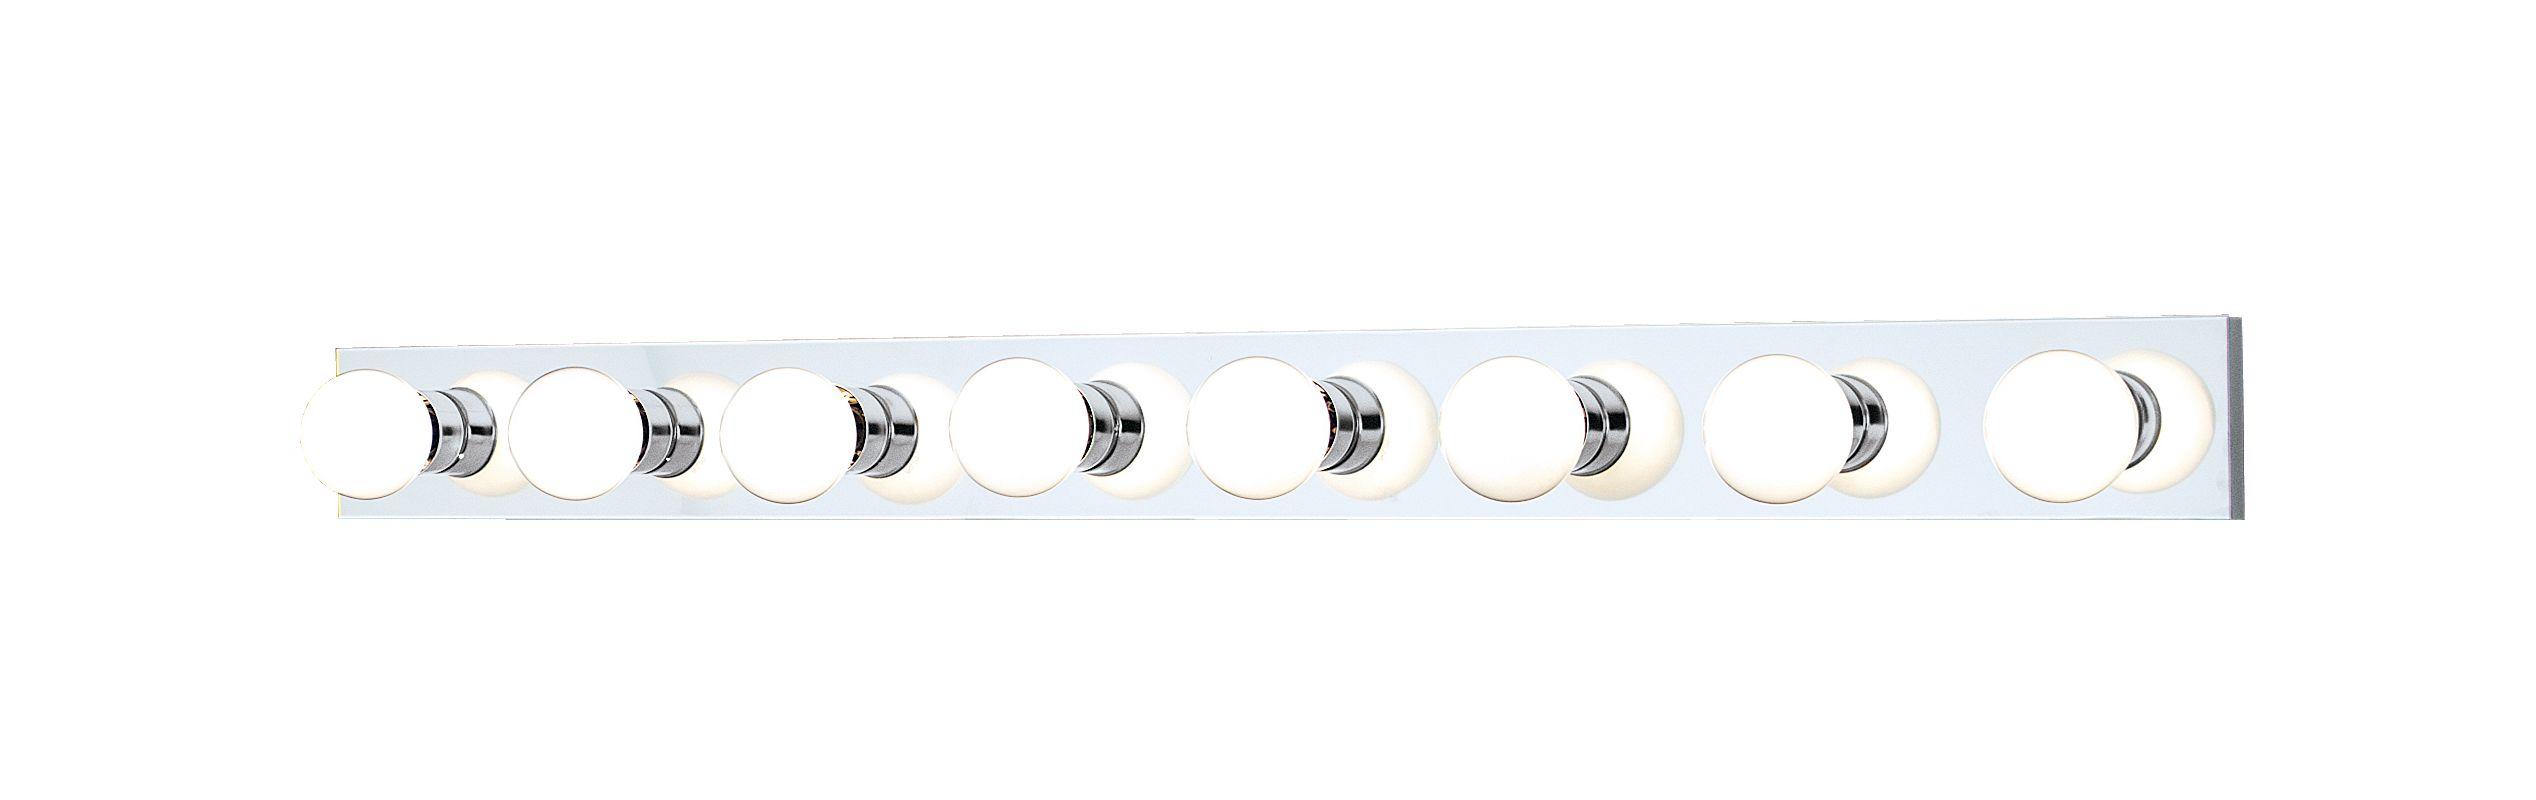 "Thomas Lighting SL7425 Functional 8 Light 48"" Wide Bathroom Fixture"